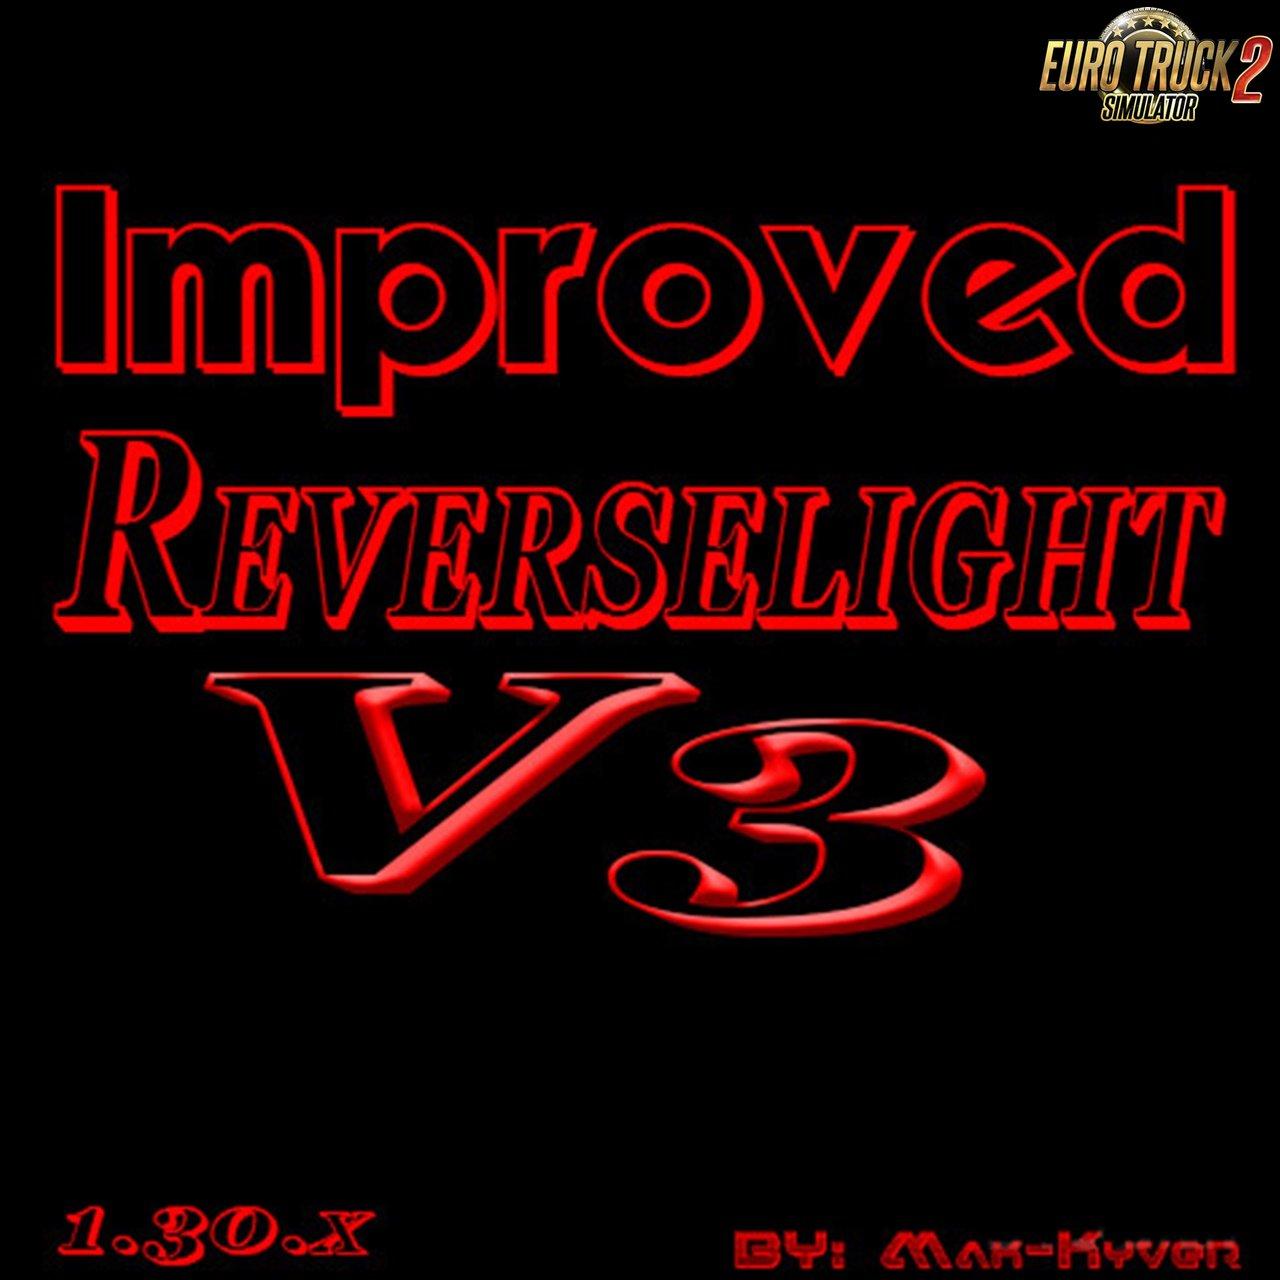 Improved Reverselights v3 [1.30.x]